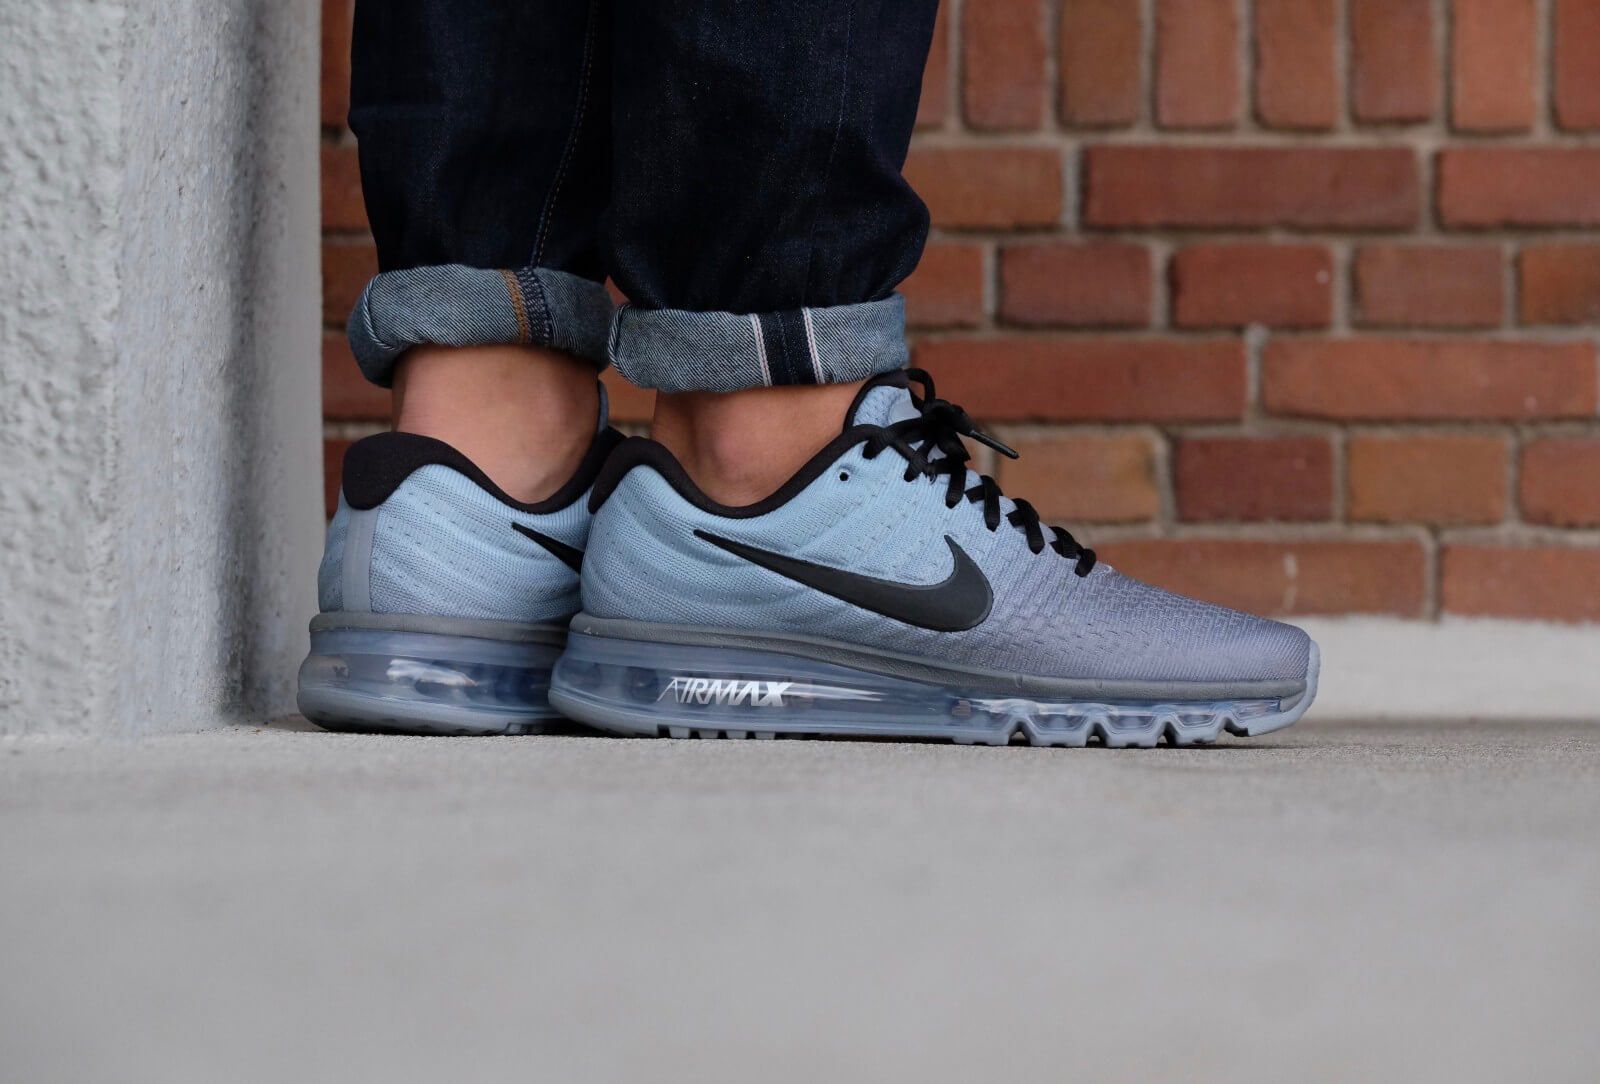 Nike Air Max 2017 Tumbled Grey 849559 003   Sneakersenzo